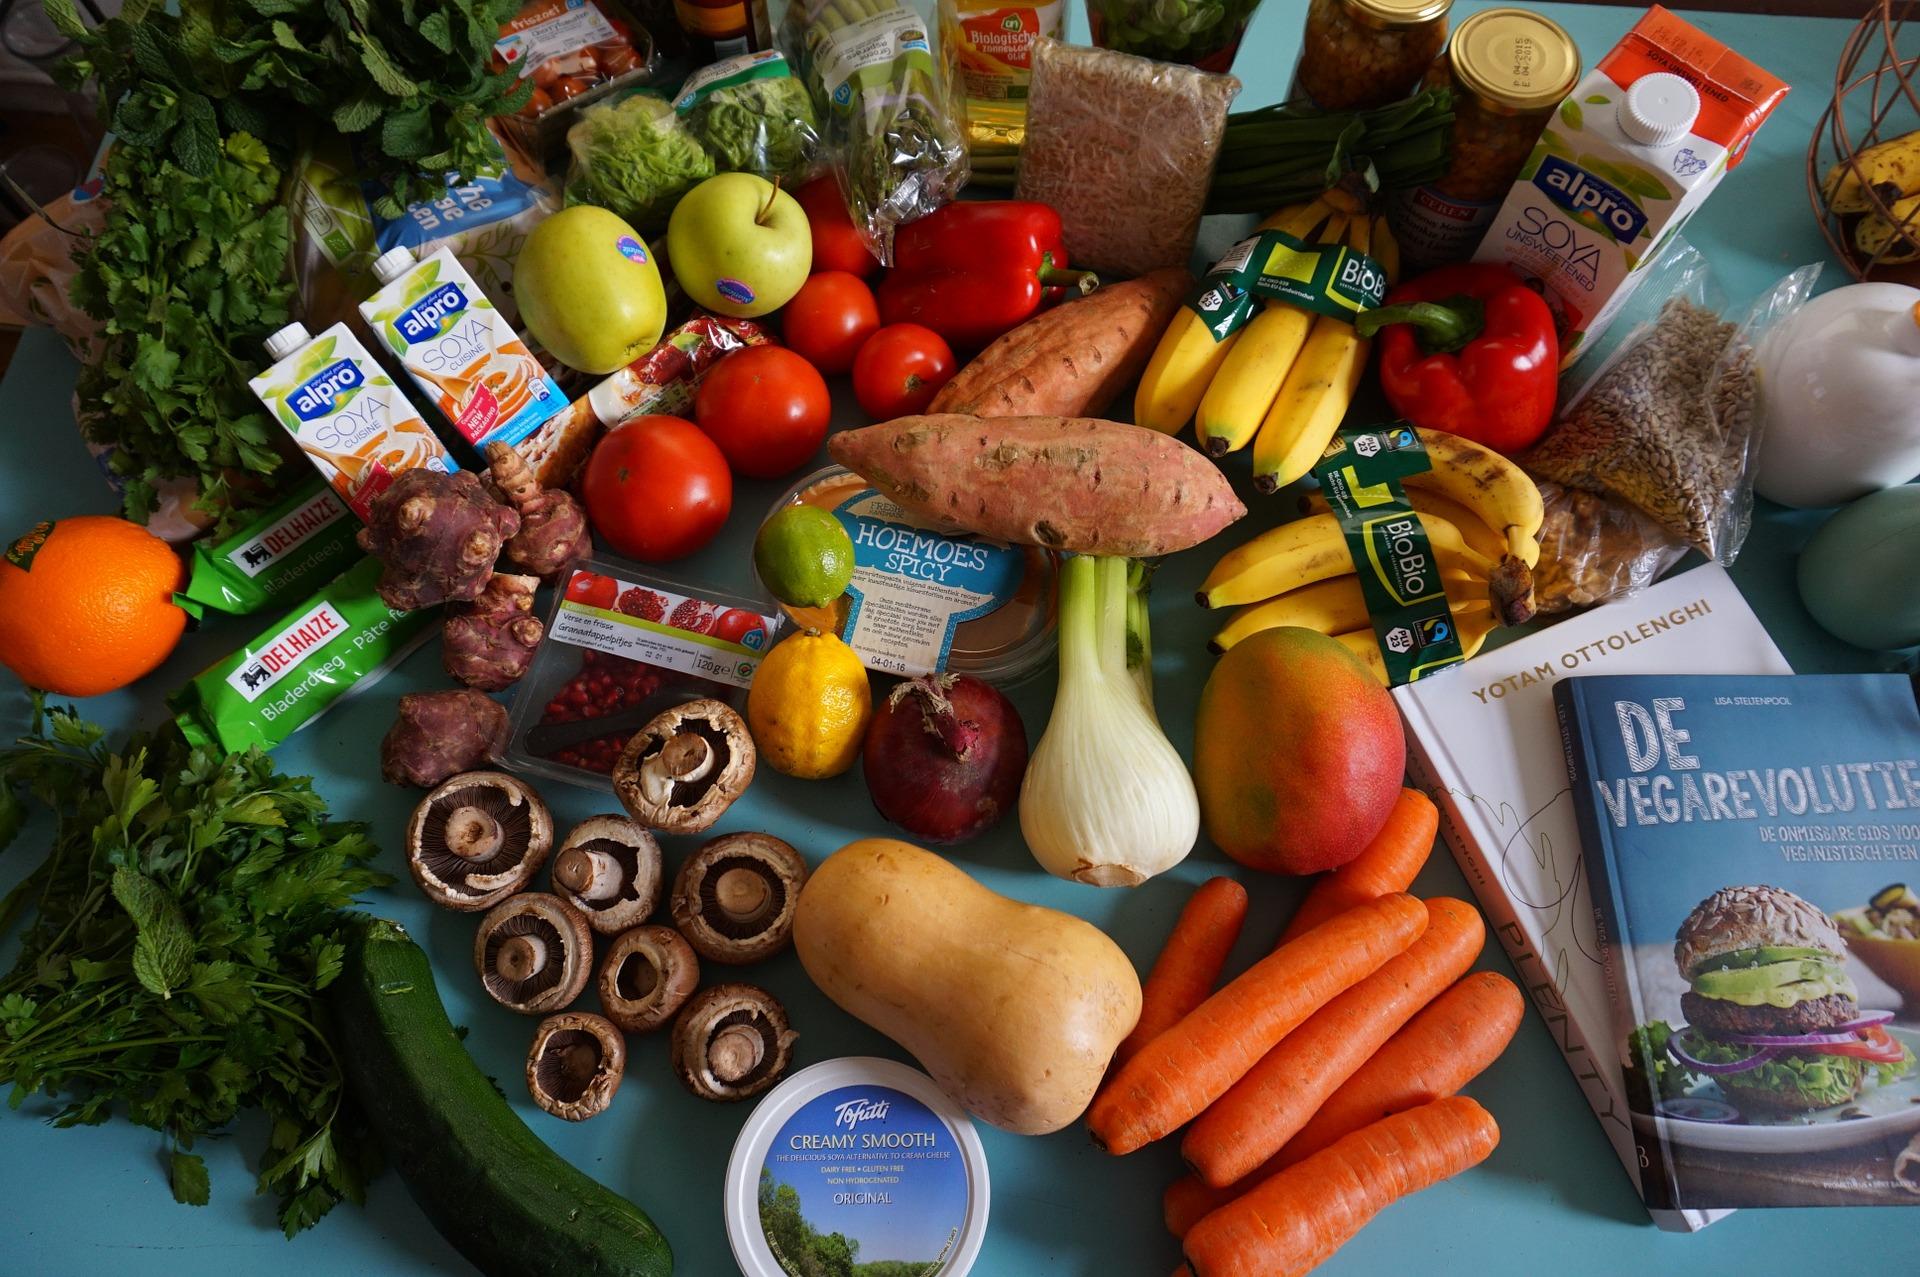 groceries 1343141 1920 저탄고지(케토) 다이어트 2탄 :차원이 다른 효과